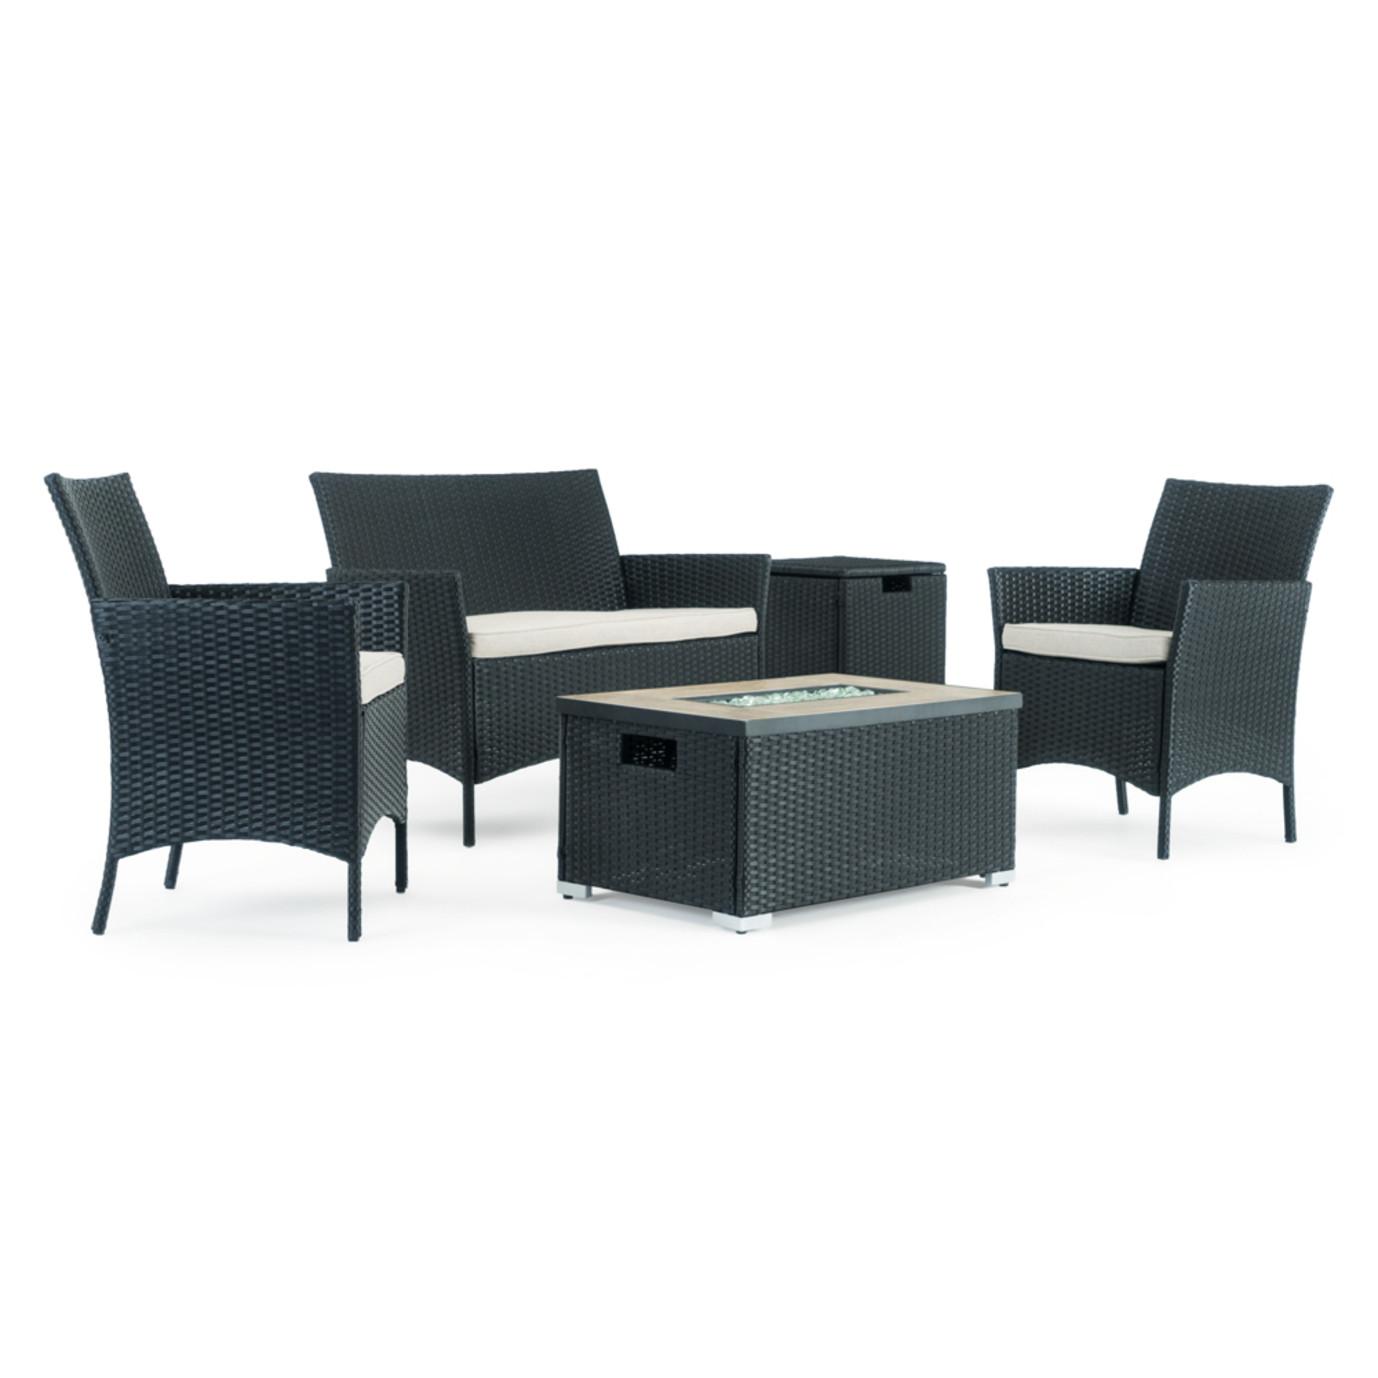 Kanab 4 Piece Fire Seating Set - Black